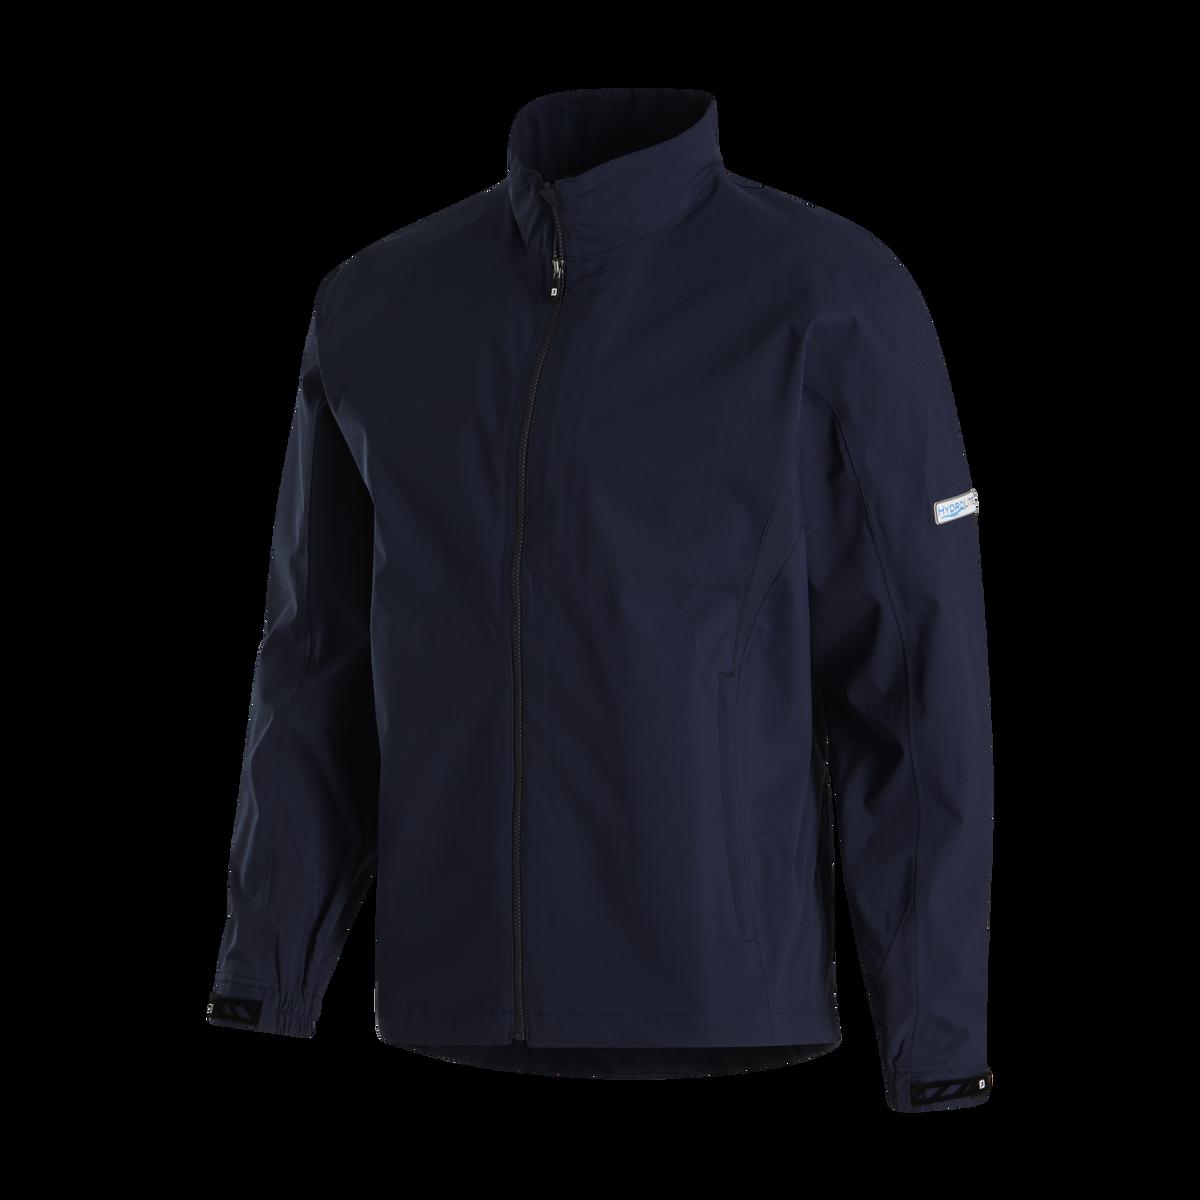 Hydrolite Rain Jacket